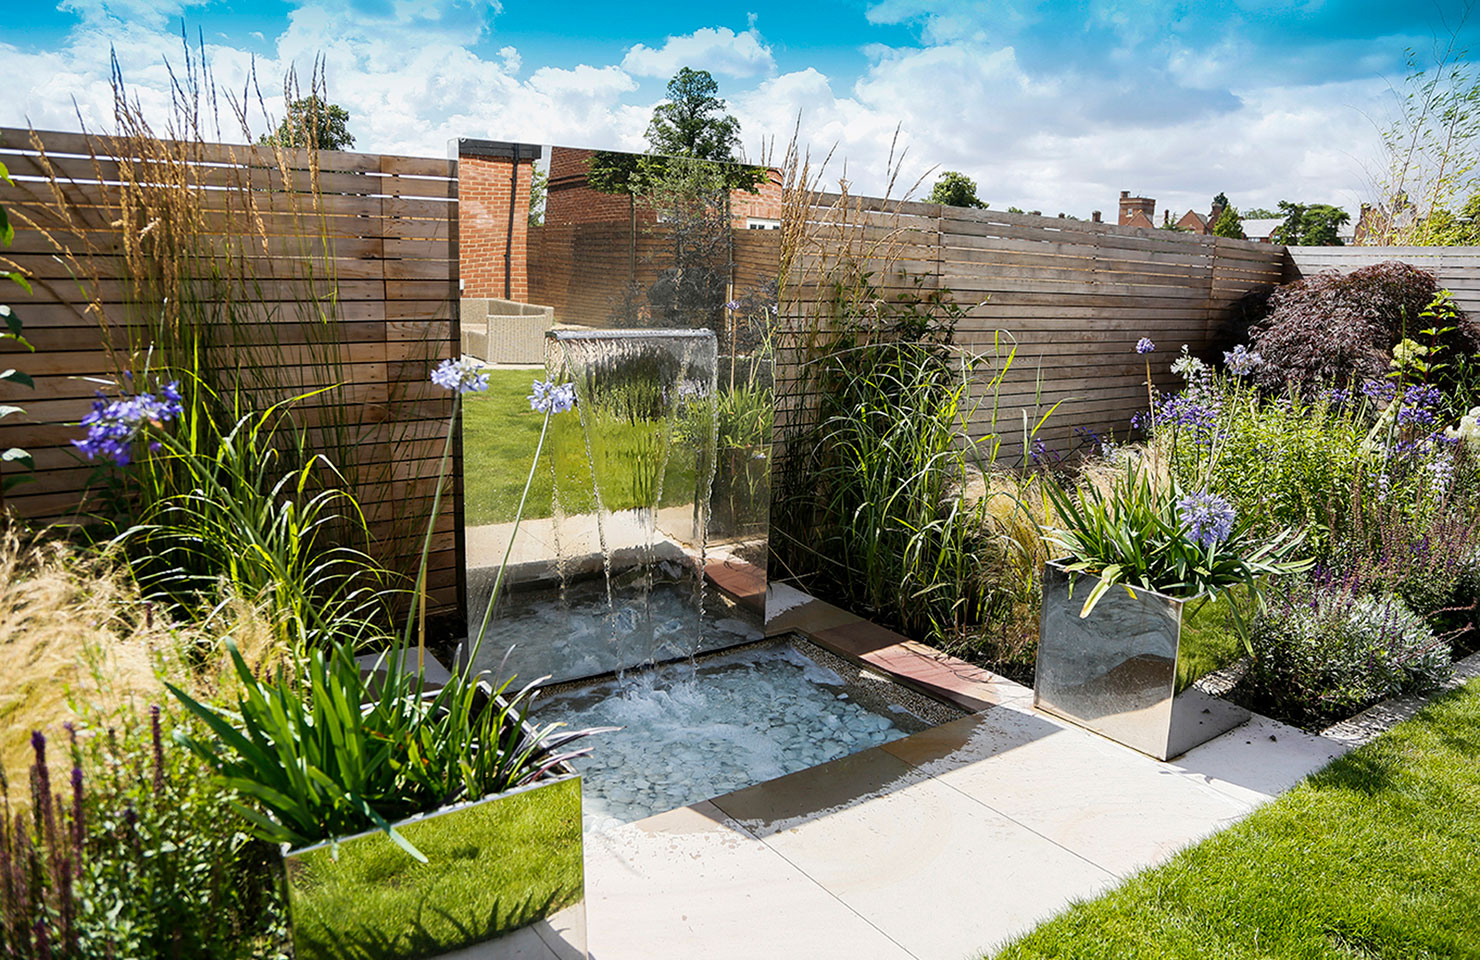 محوطه سازی حیاط ، باغ ، خانه ویلایی